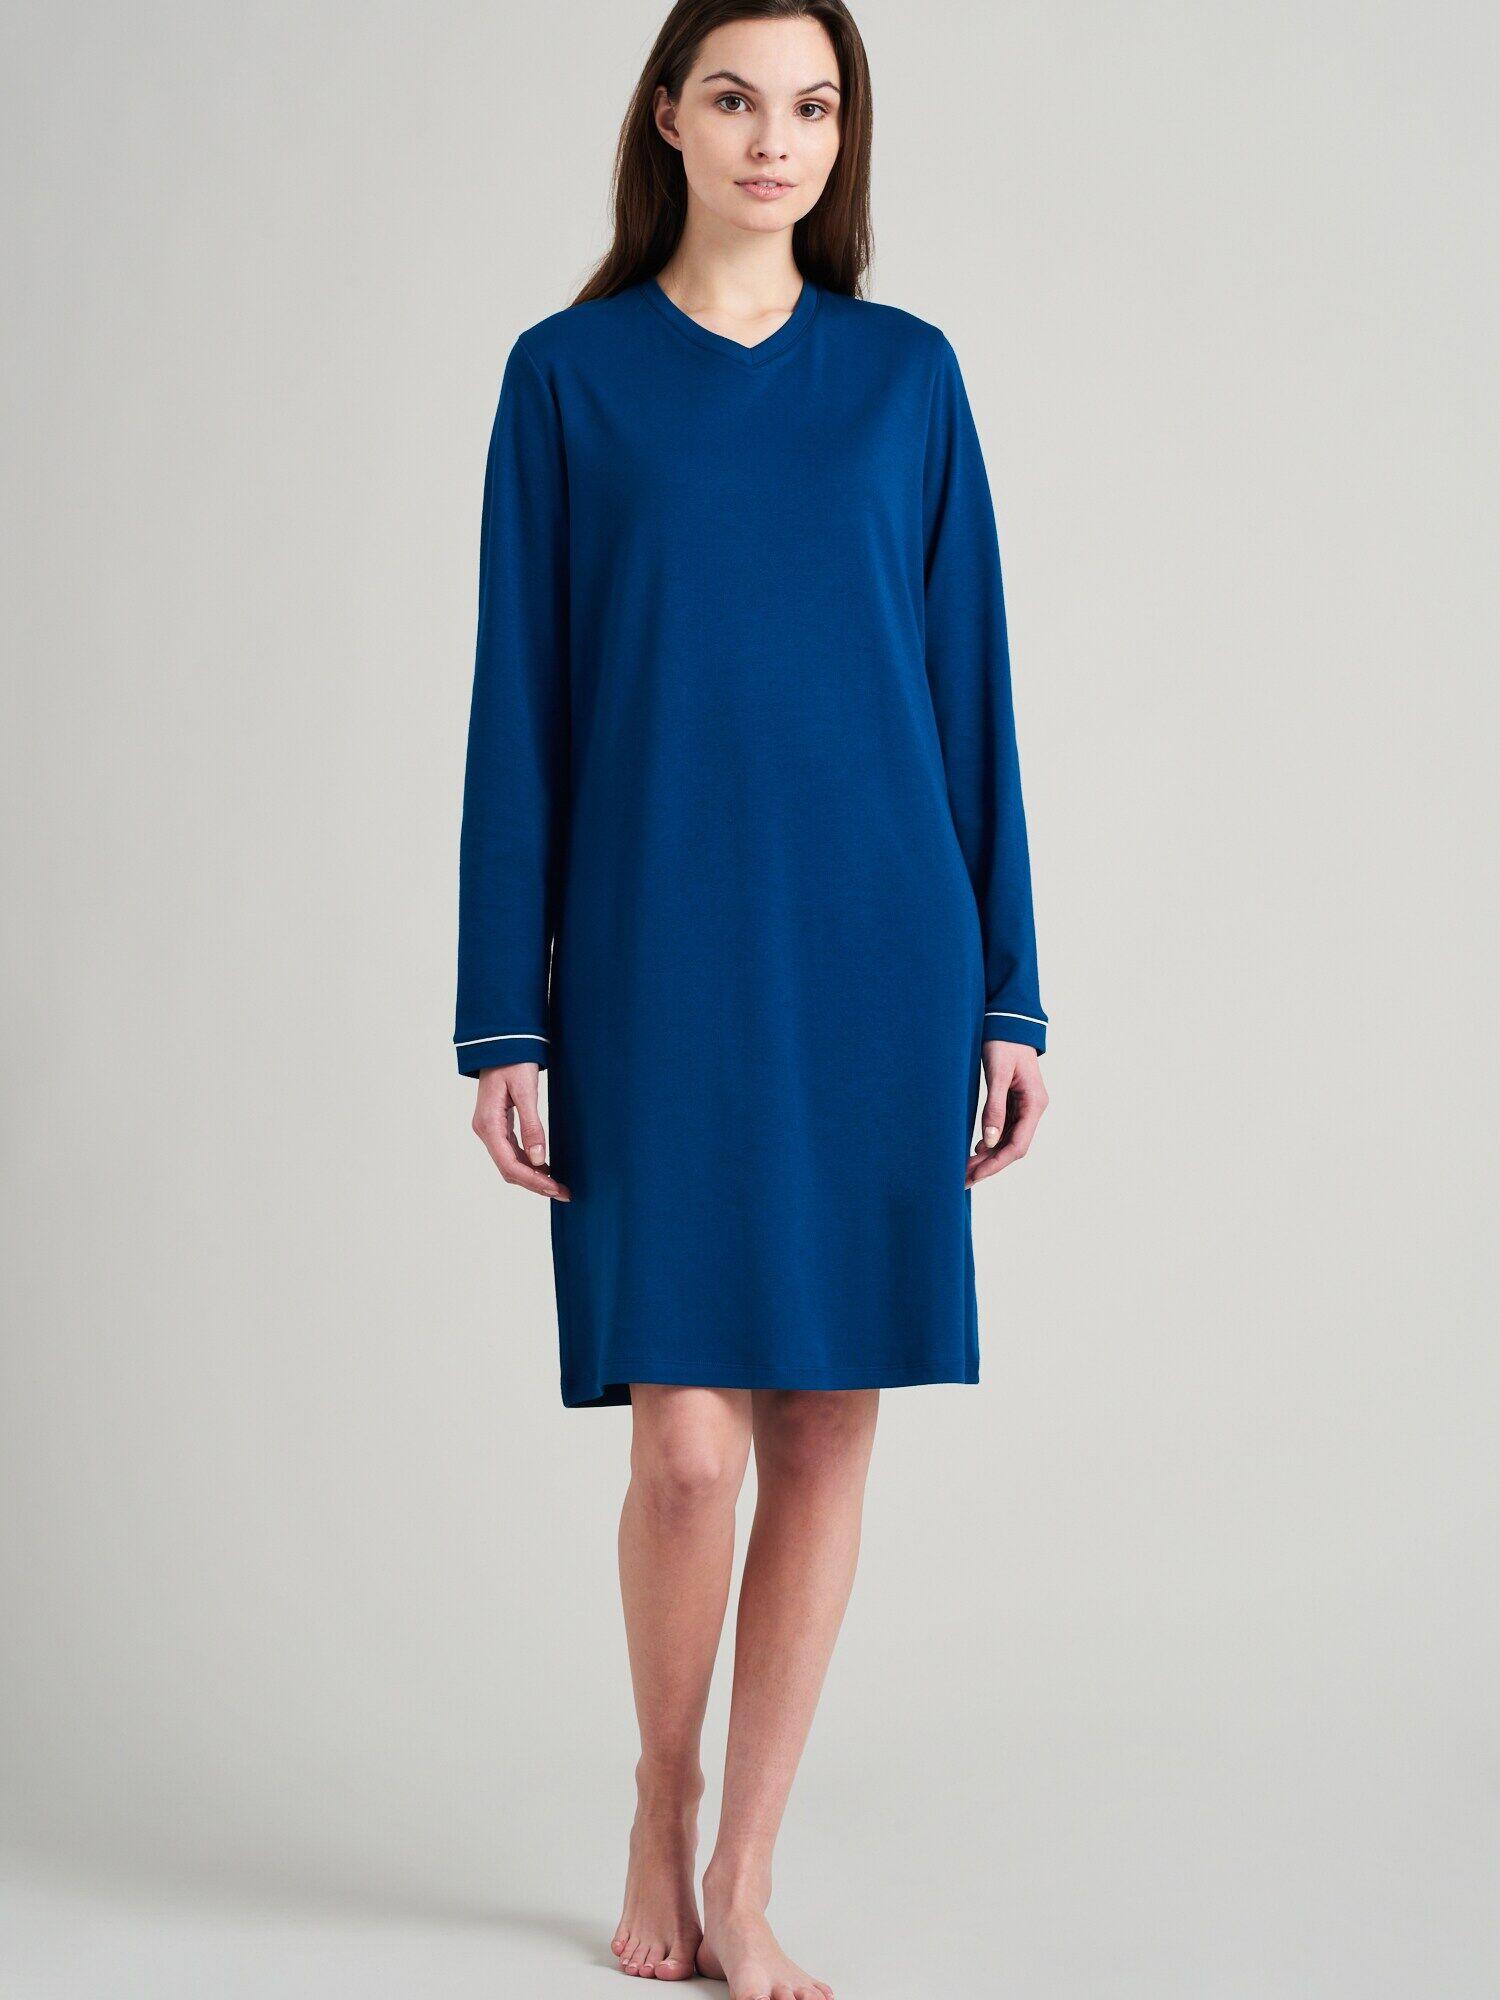 SEIDENSTICKER Chemise de nuit ' Classic Essential '  - Bleu - Taille: 48 - female